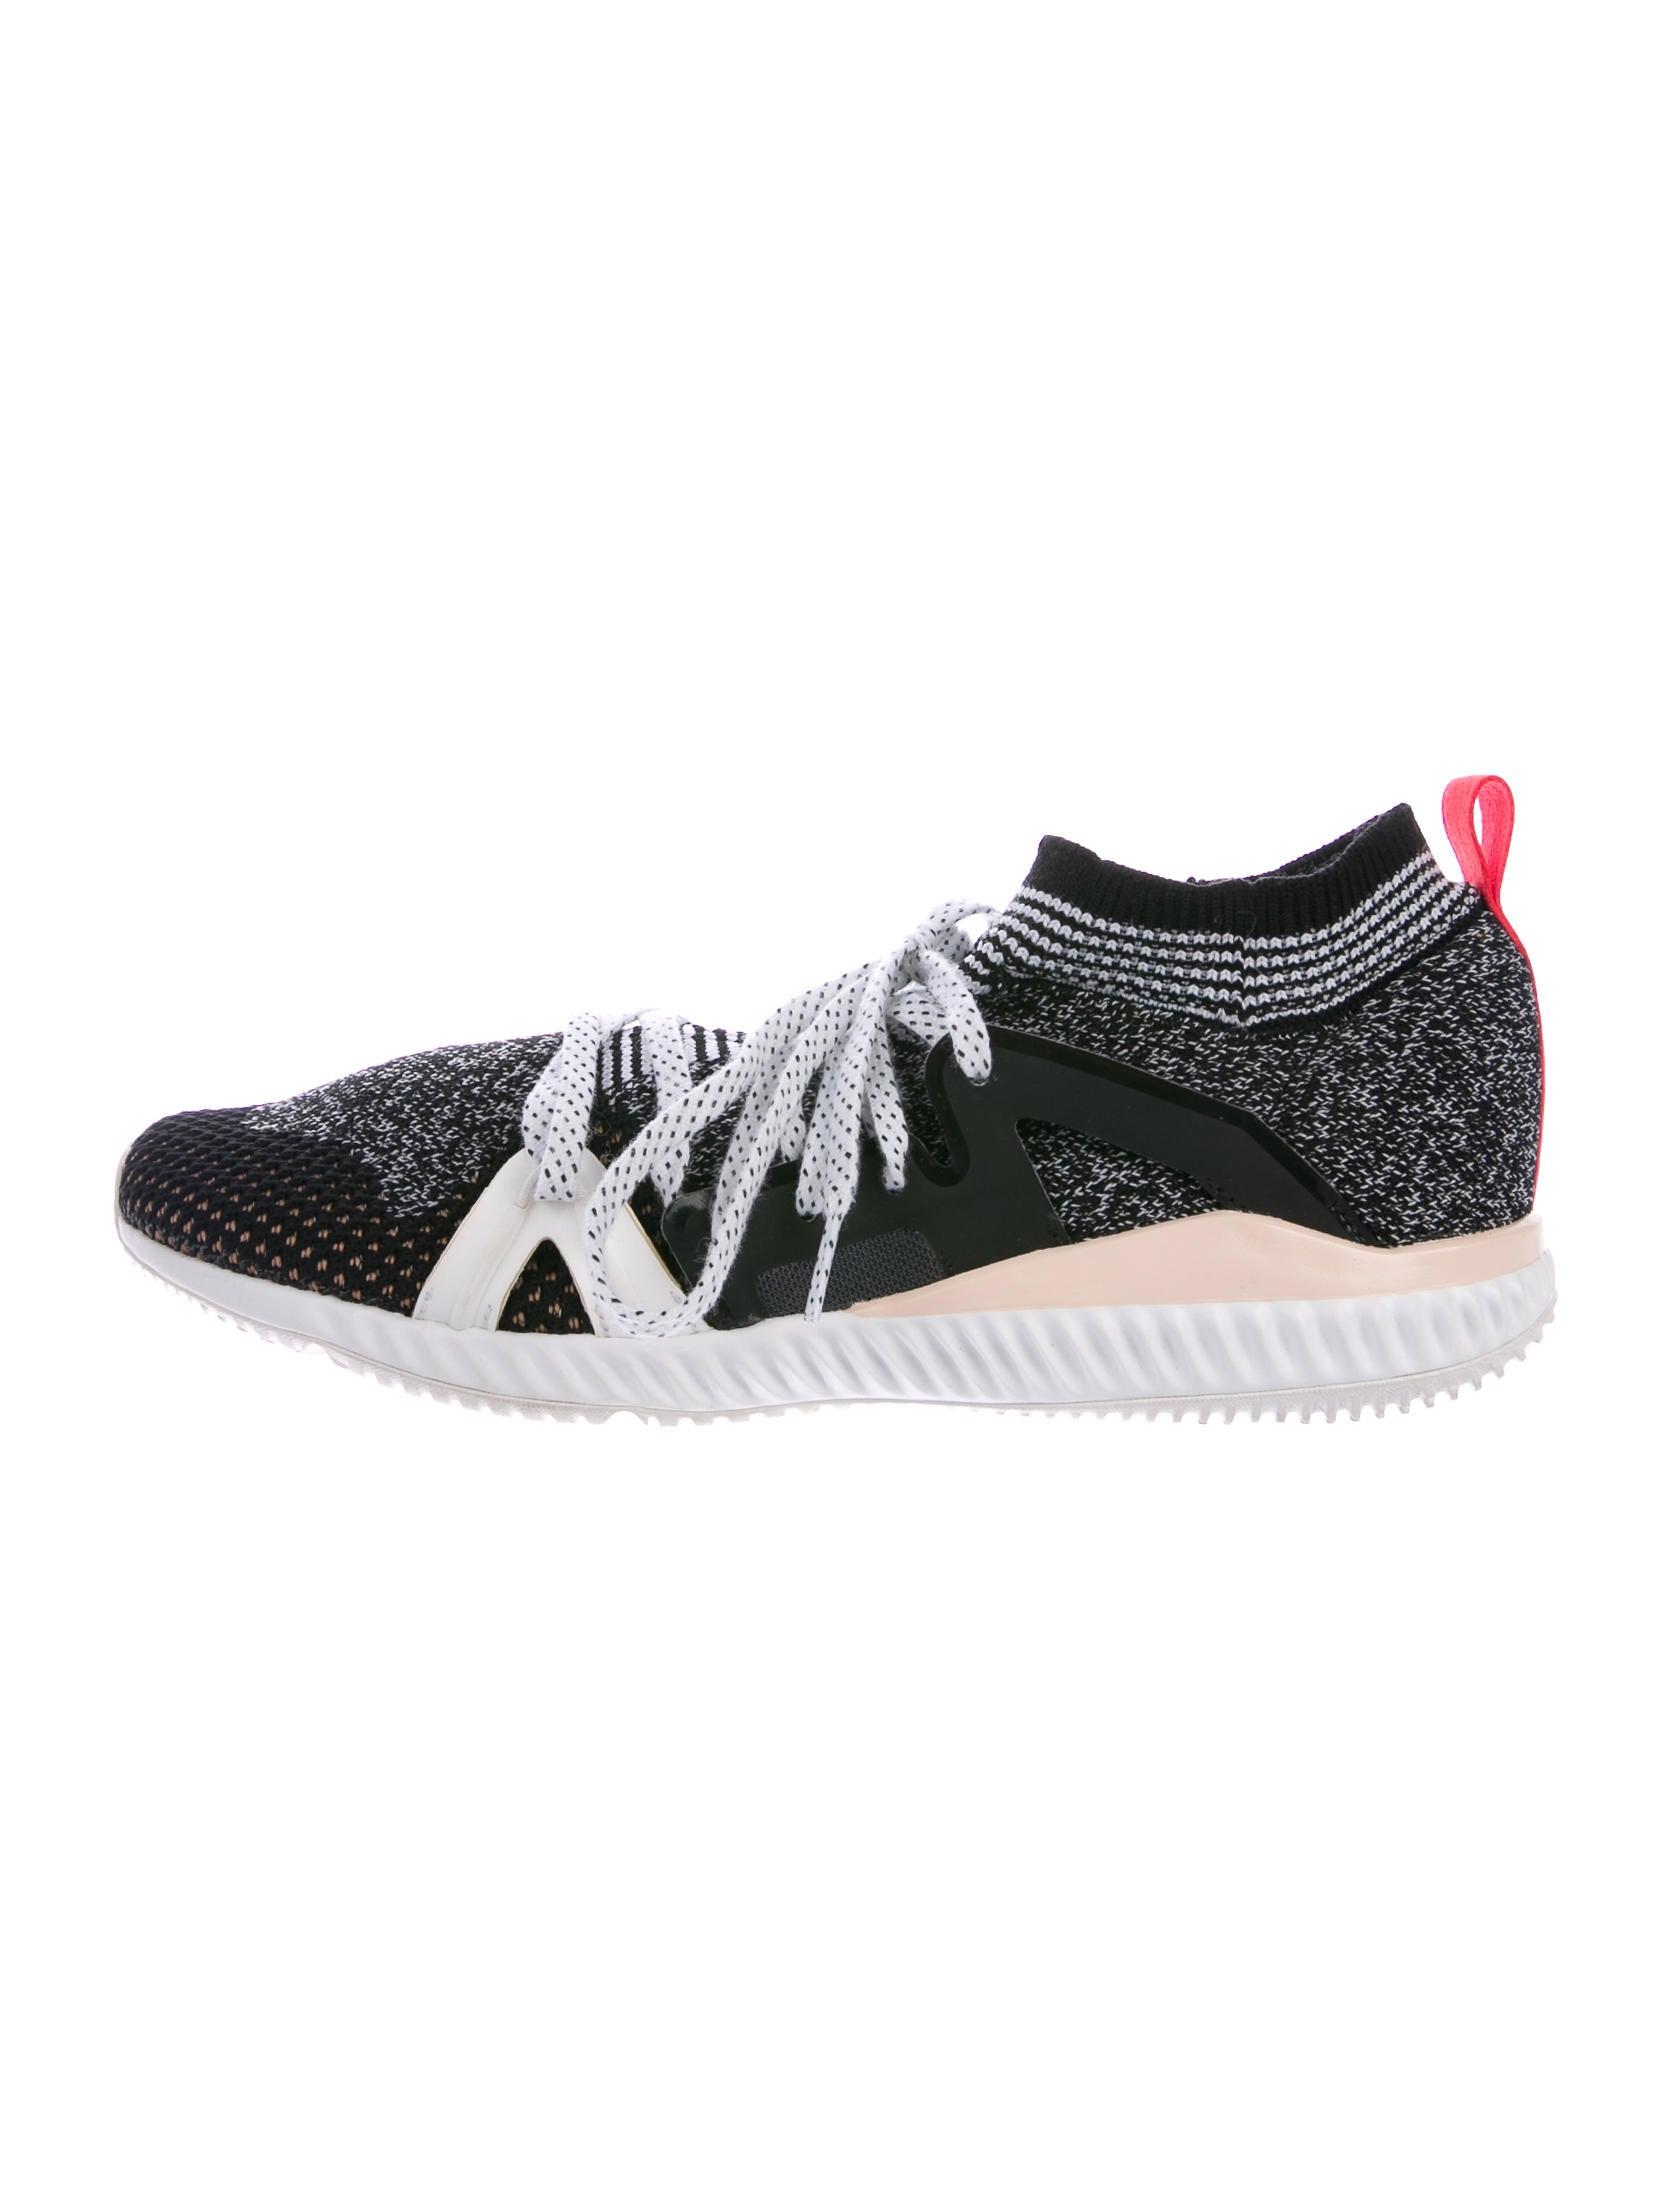 Stella para McCartney para Adidas Crazymove Crazymove Bounce 19994 Knit Sneakers Shoes 2613336 - hvorvikankobe.website